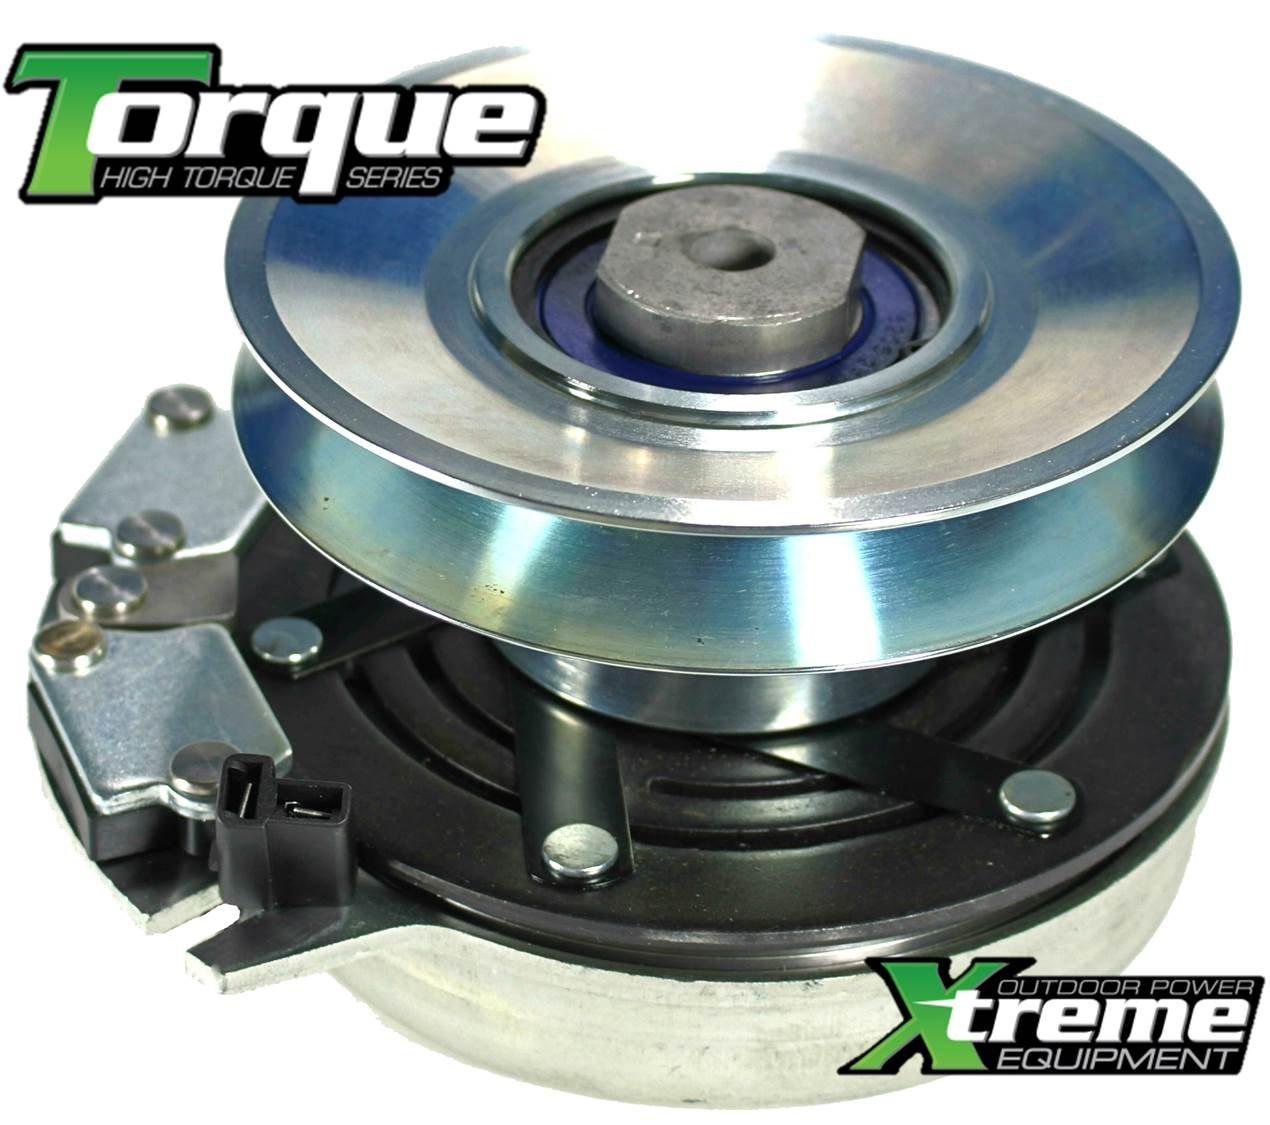 X0327 Replaces John Deere AM126100 PTO Clutch GT225 GT235 GT235E GT245 GX255 LT190 SST15 SST16 SST18 LX255 LX266 LX277 LX279 LX280 LX288 LX289 Bearing Upgrade OEM UPGRADE!